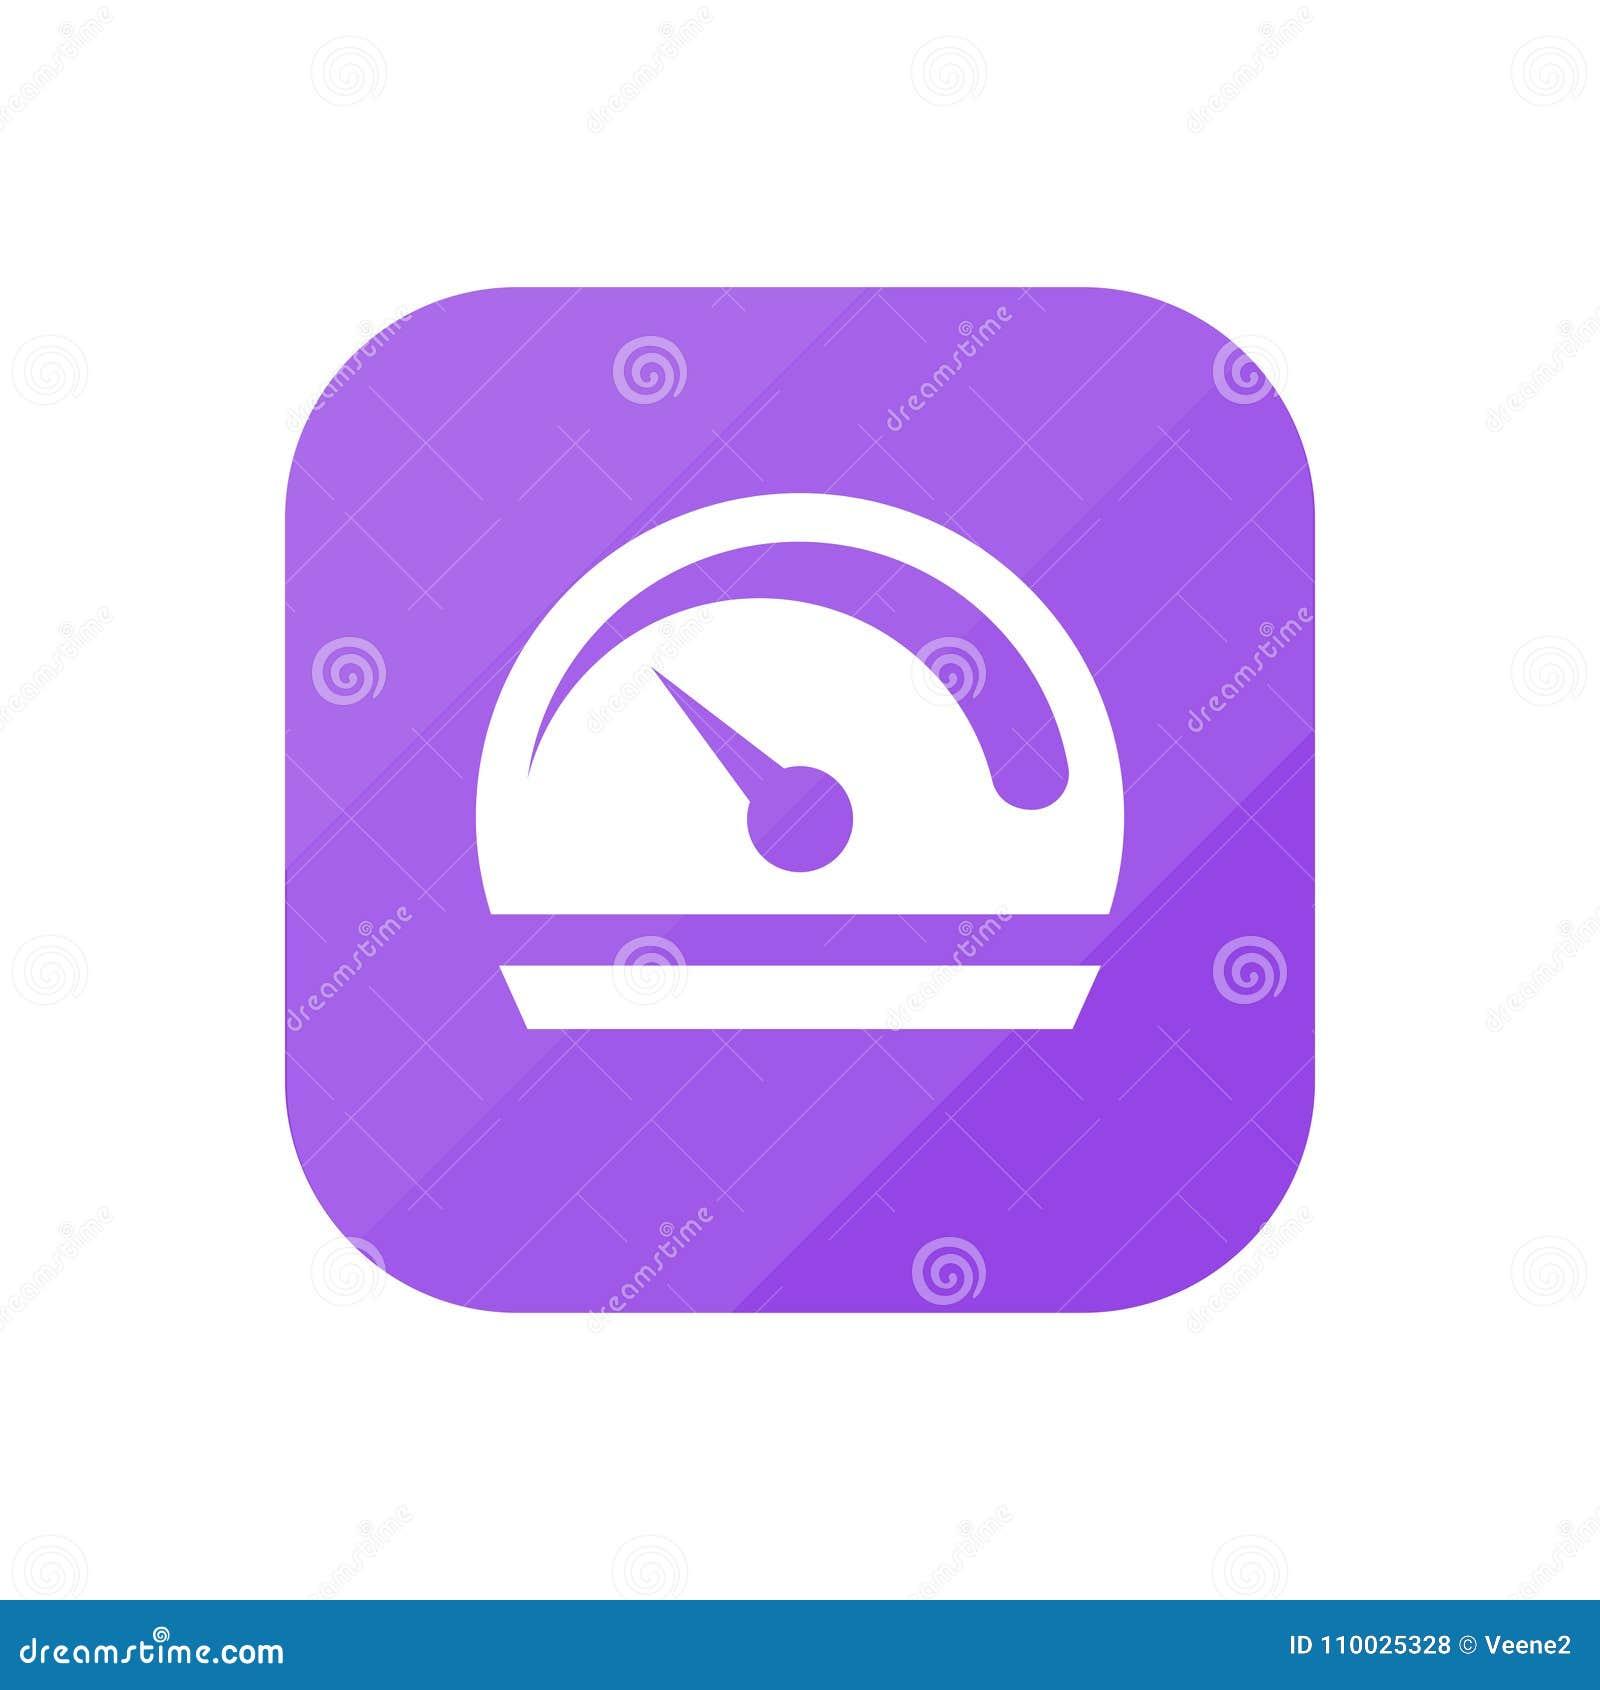 Dashboard - App Pictogram